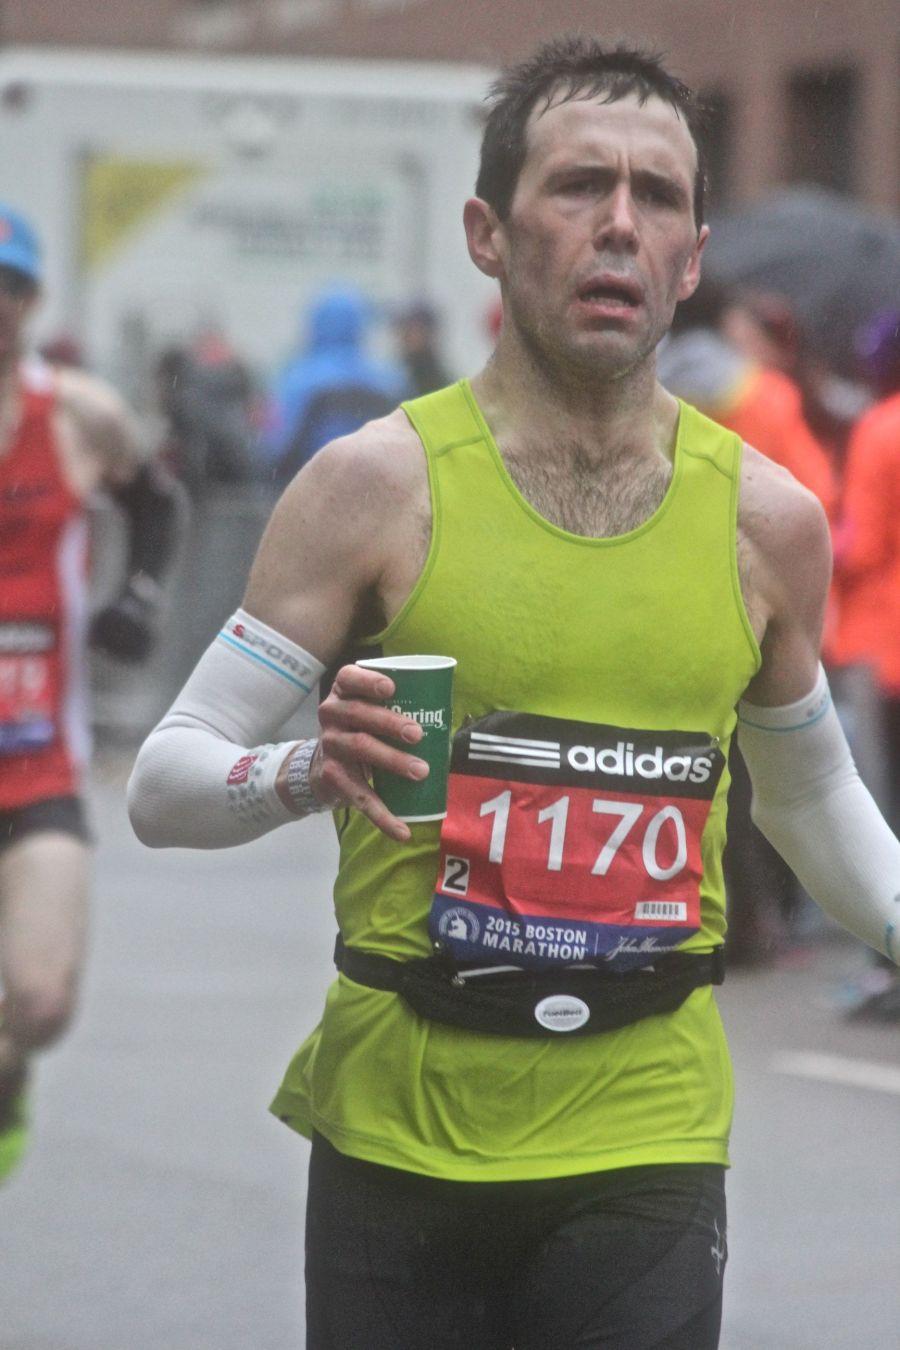 boston marathon april 20 2015 racer number 1170